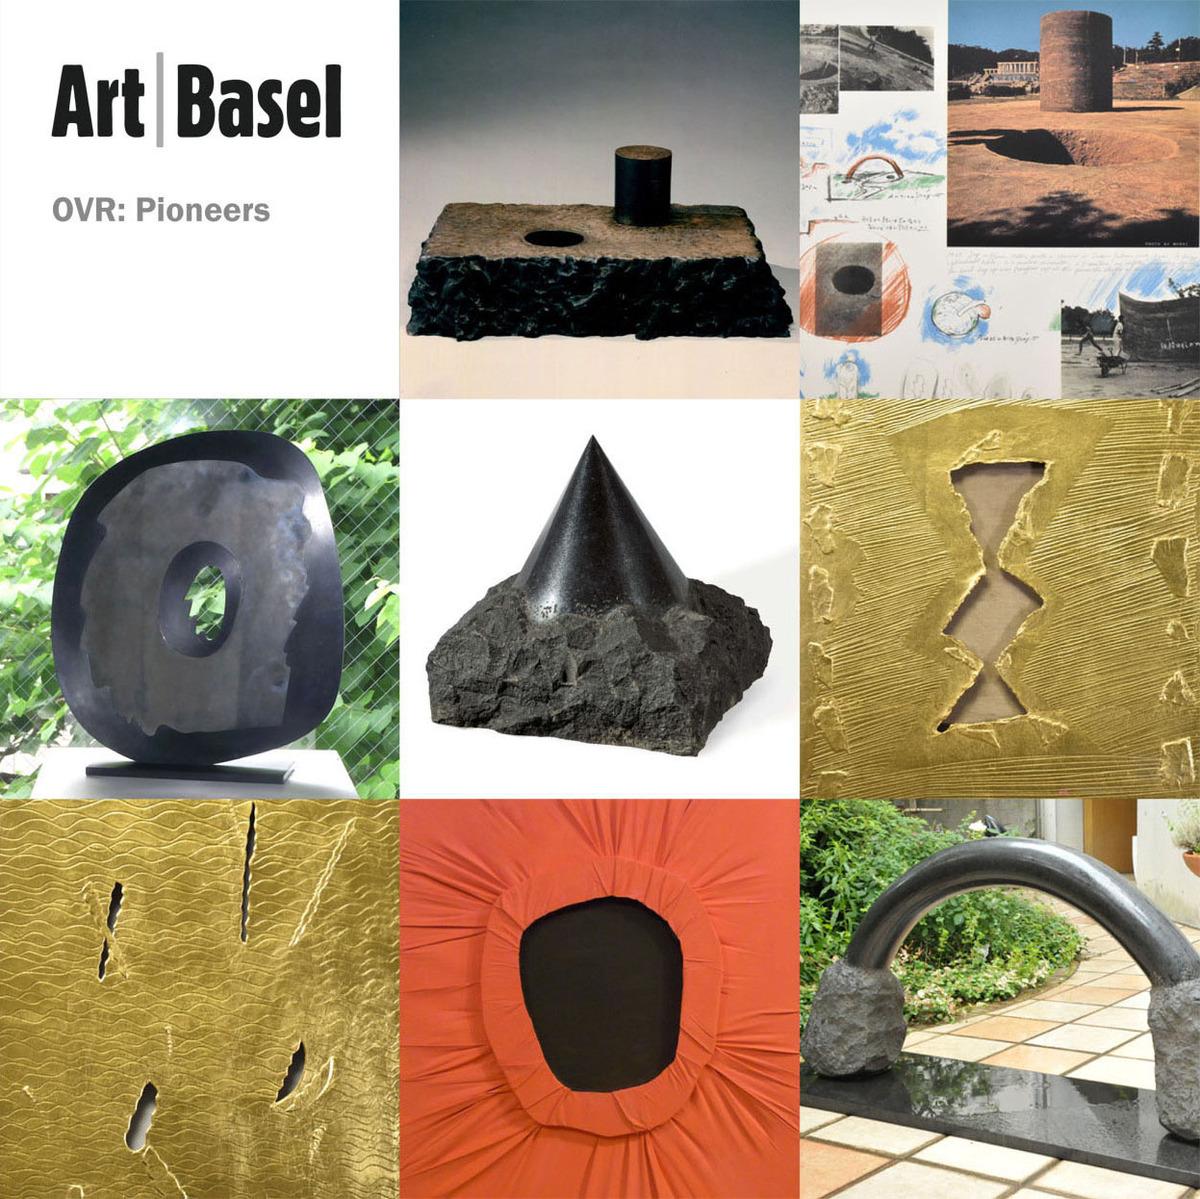 「Art Basel OVR: Pioneers」に出展します。3月24日〜28日